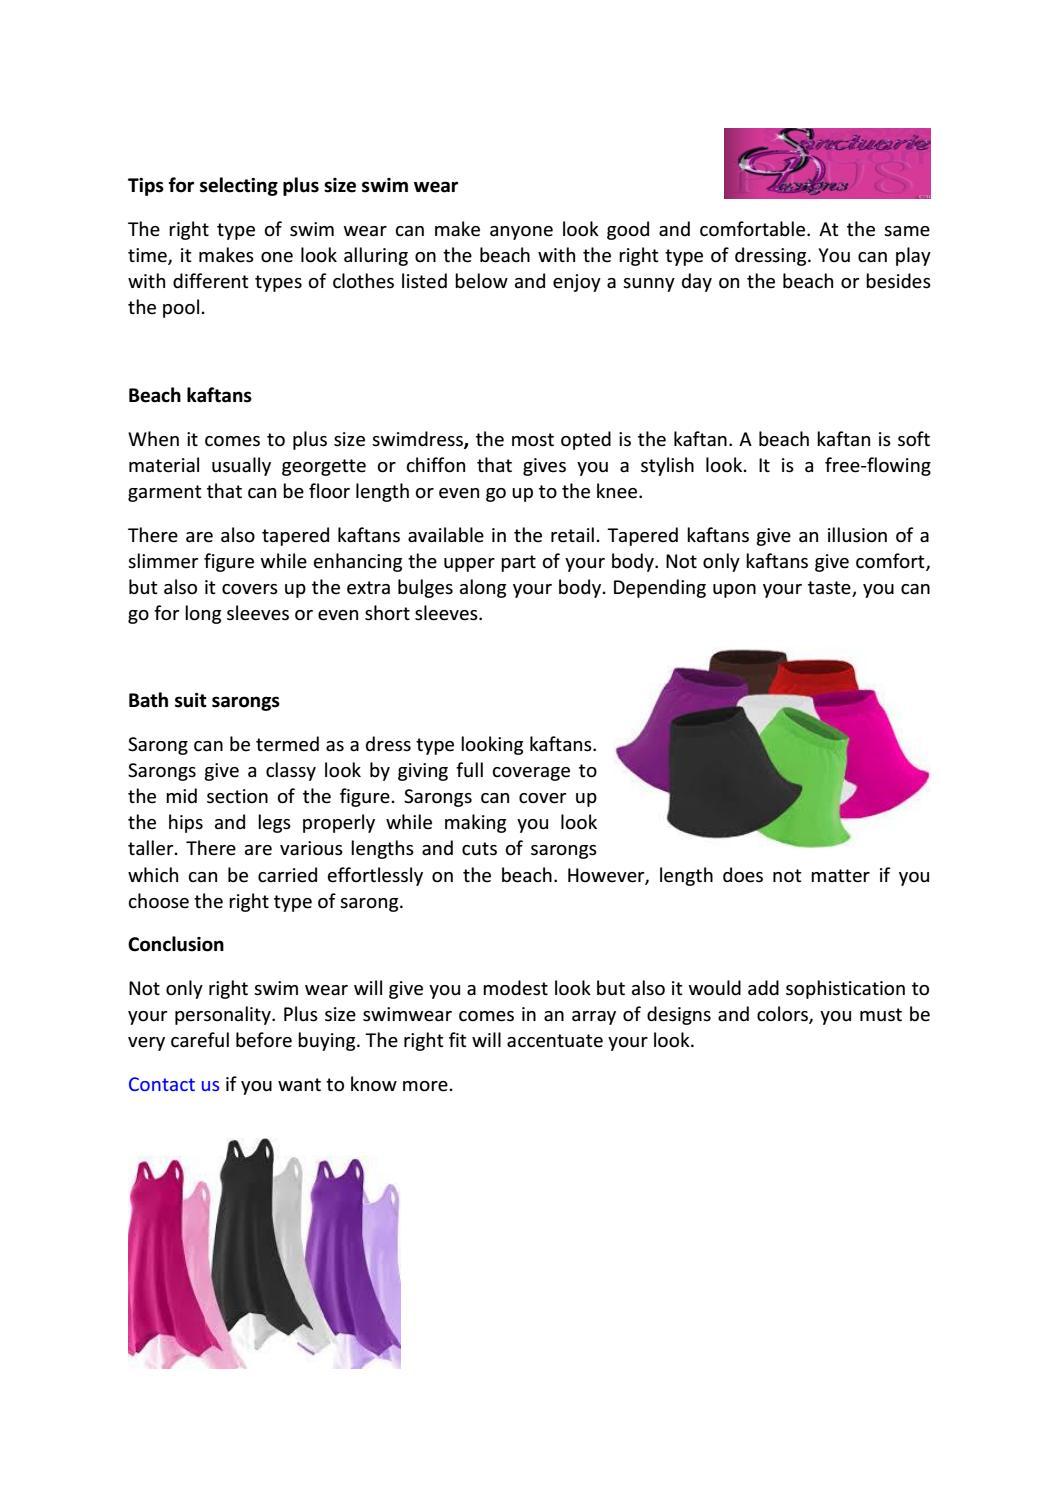 05d8c6e838 Tips for selecting plus size swim wear by Sanctuarie Designs - issuu